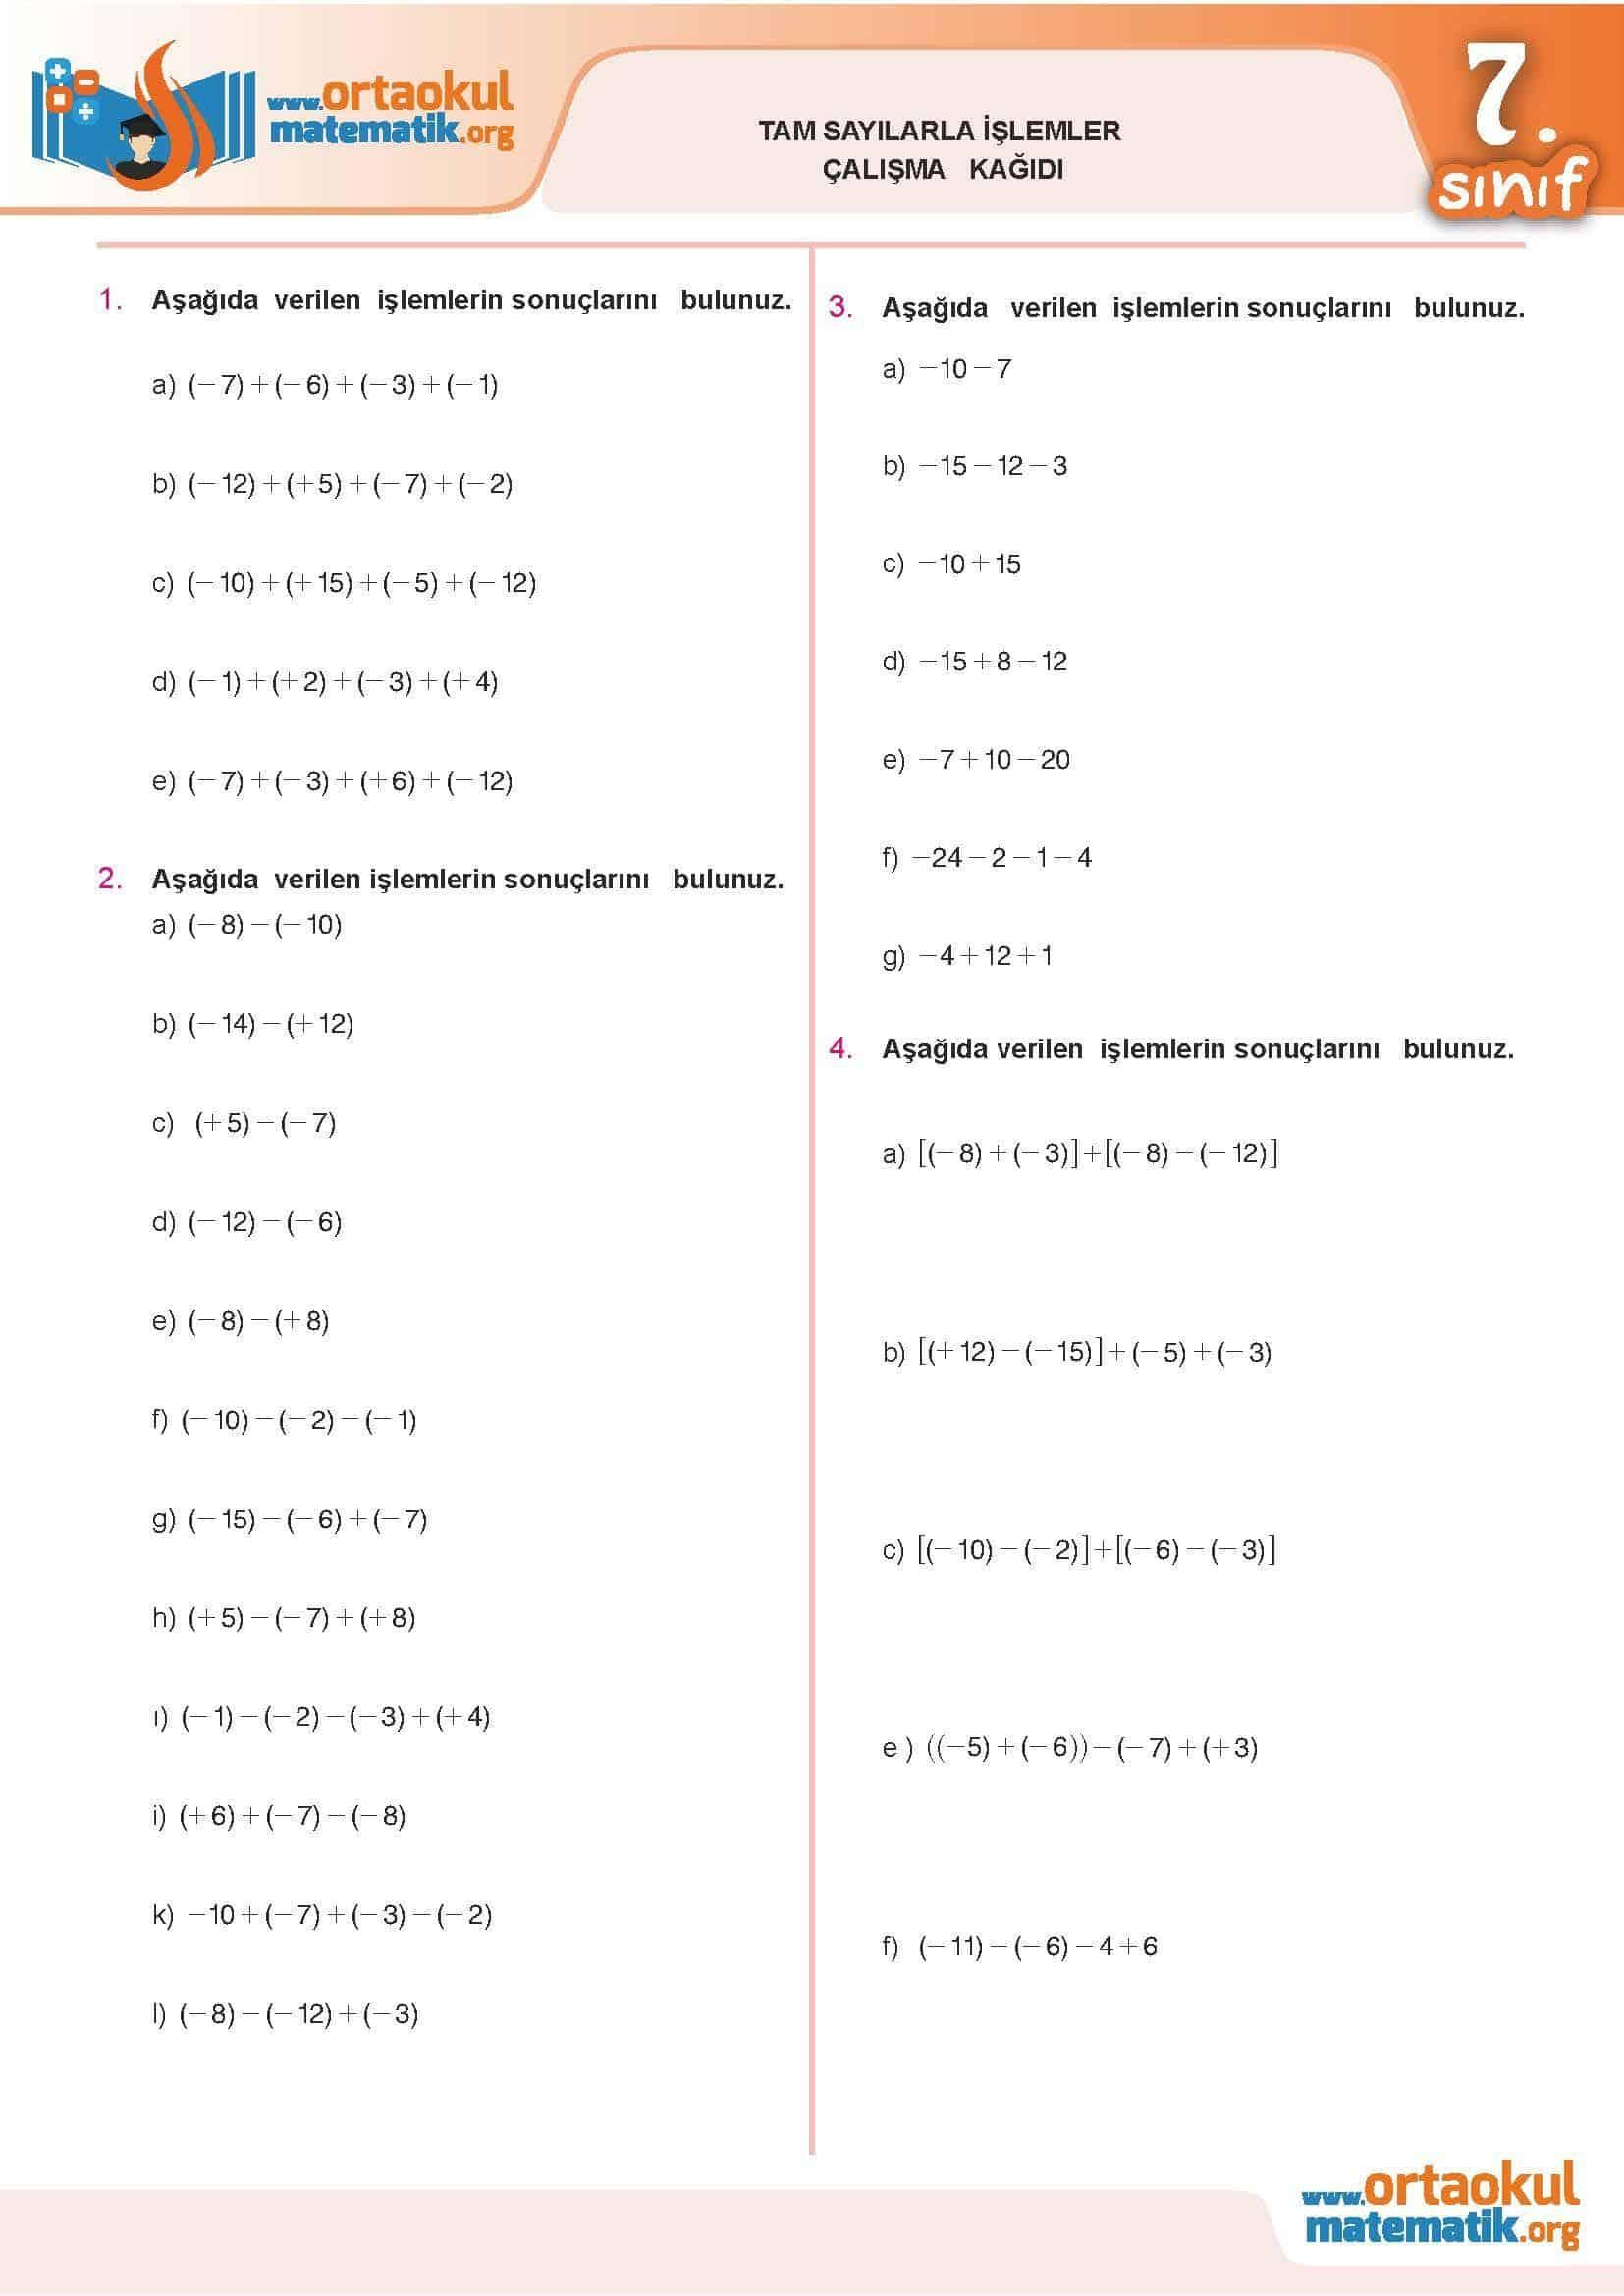 Tam Sayilarla Islemler Calisma Kagidi Ortaokul Matematik